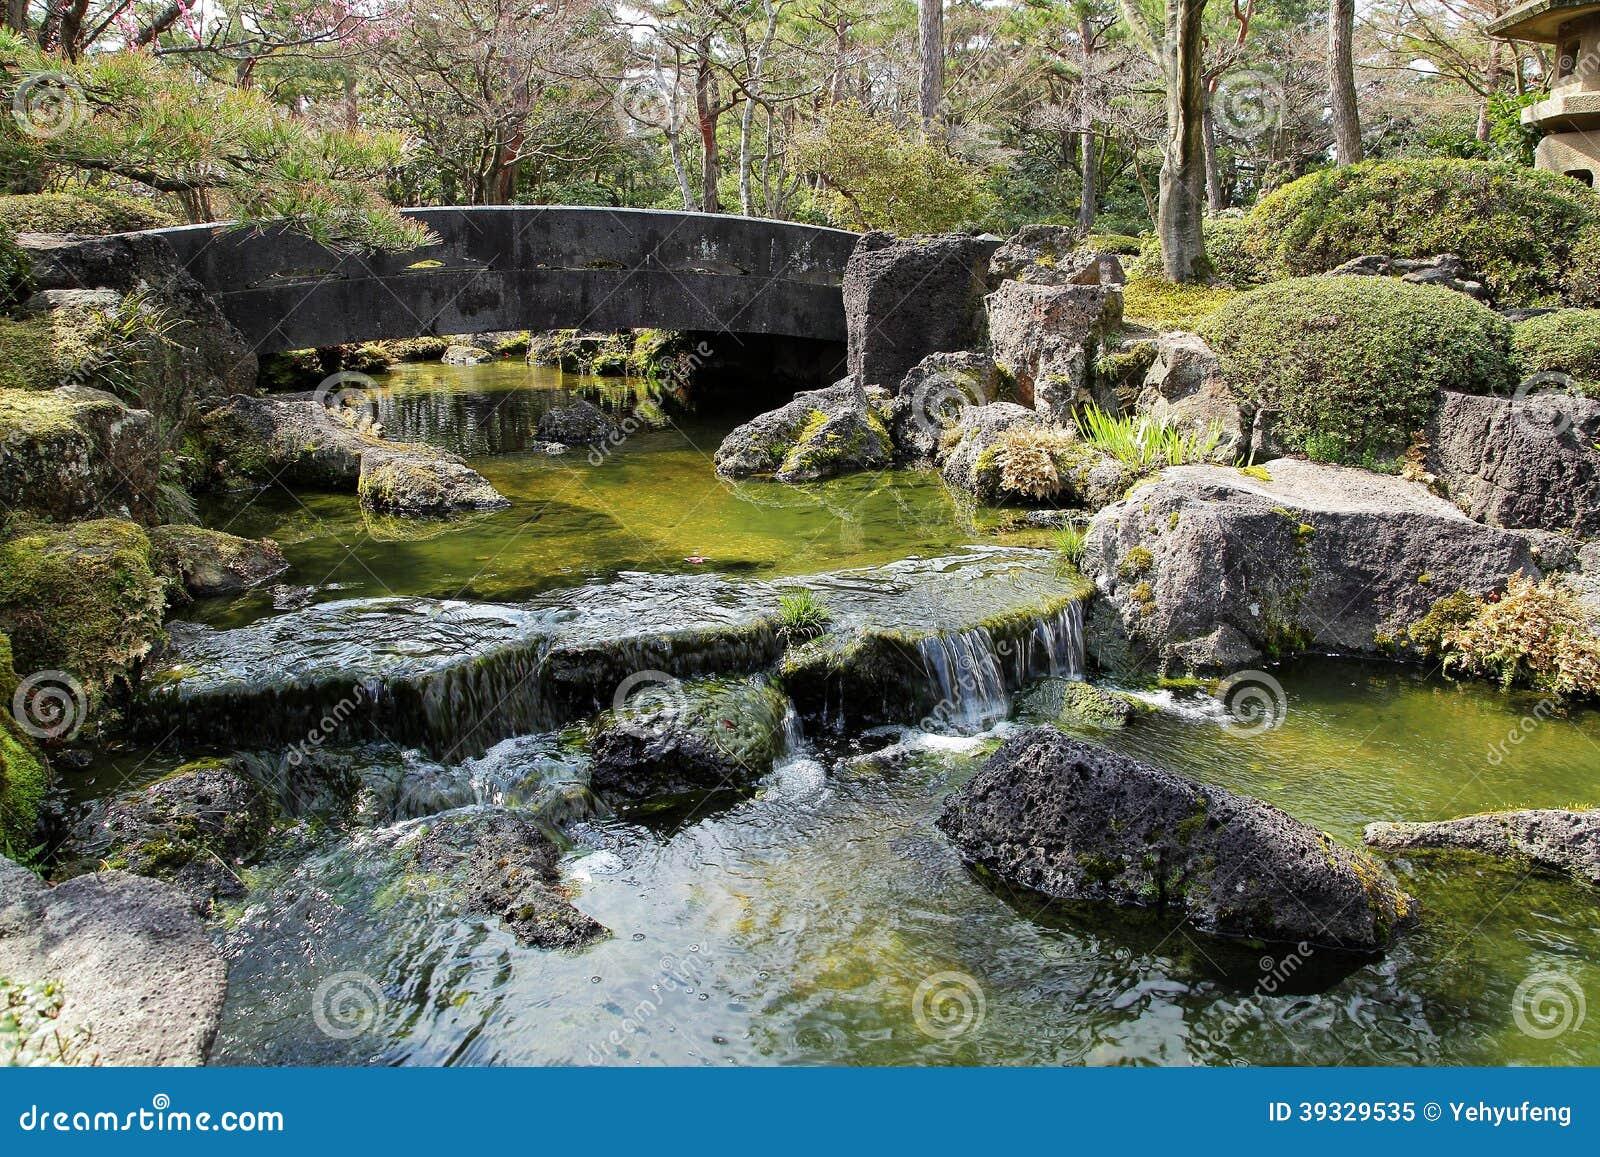 Bridge Flowing Garden Japanese Landscape Over Quiet Stone ...